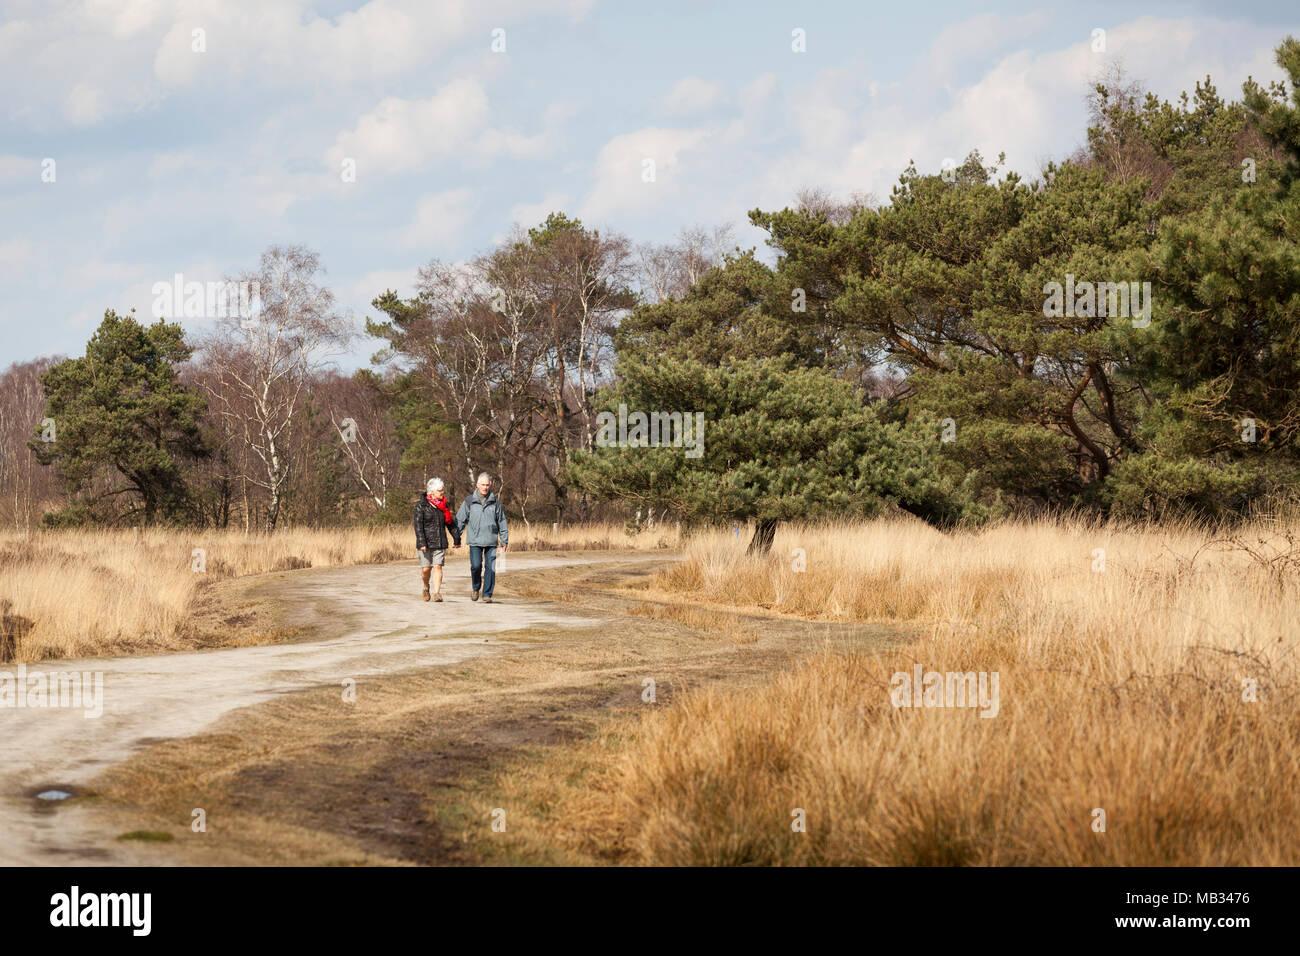 Couple walking National Park 'de Groote Peel' in spring, Netherlands - Stock Image